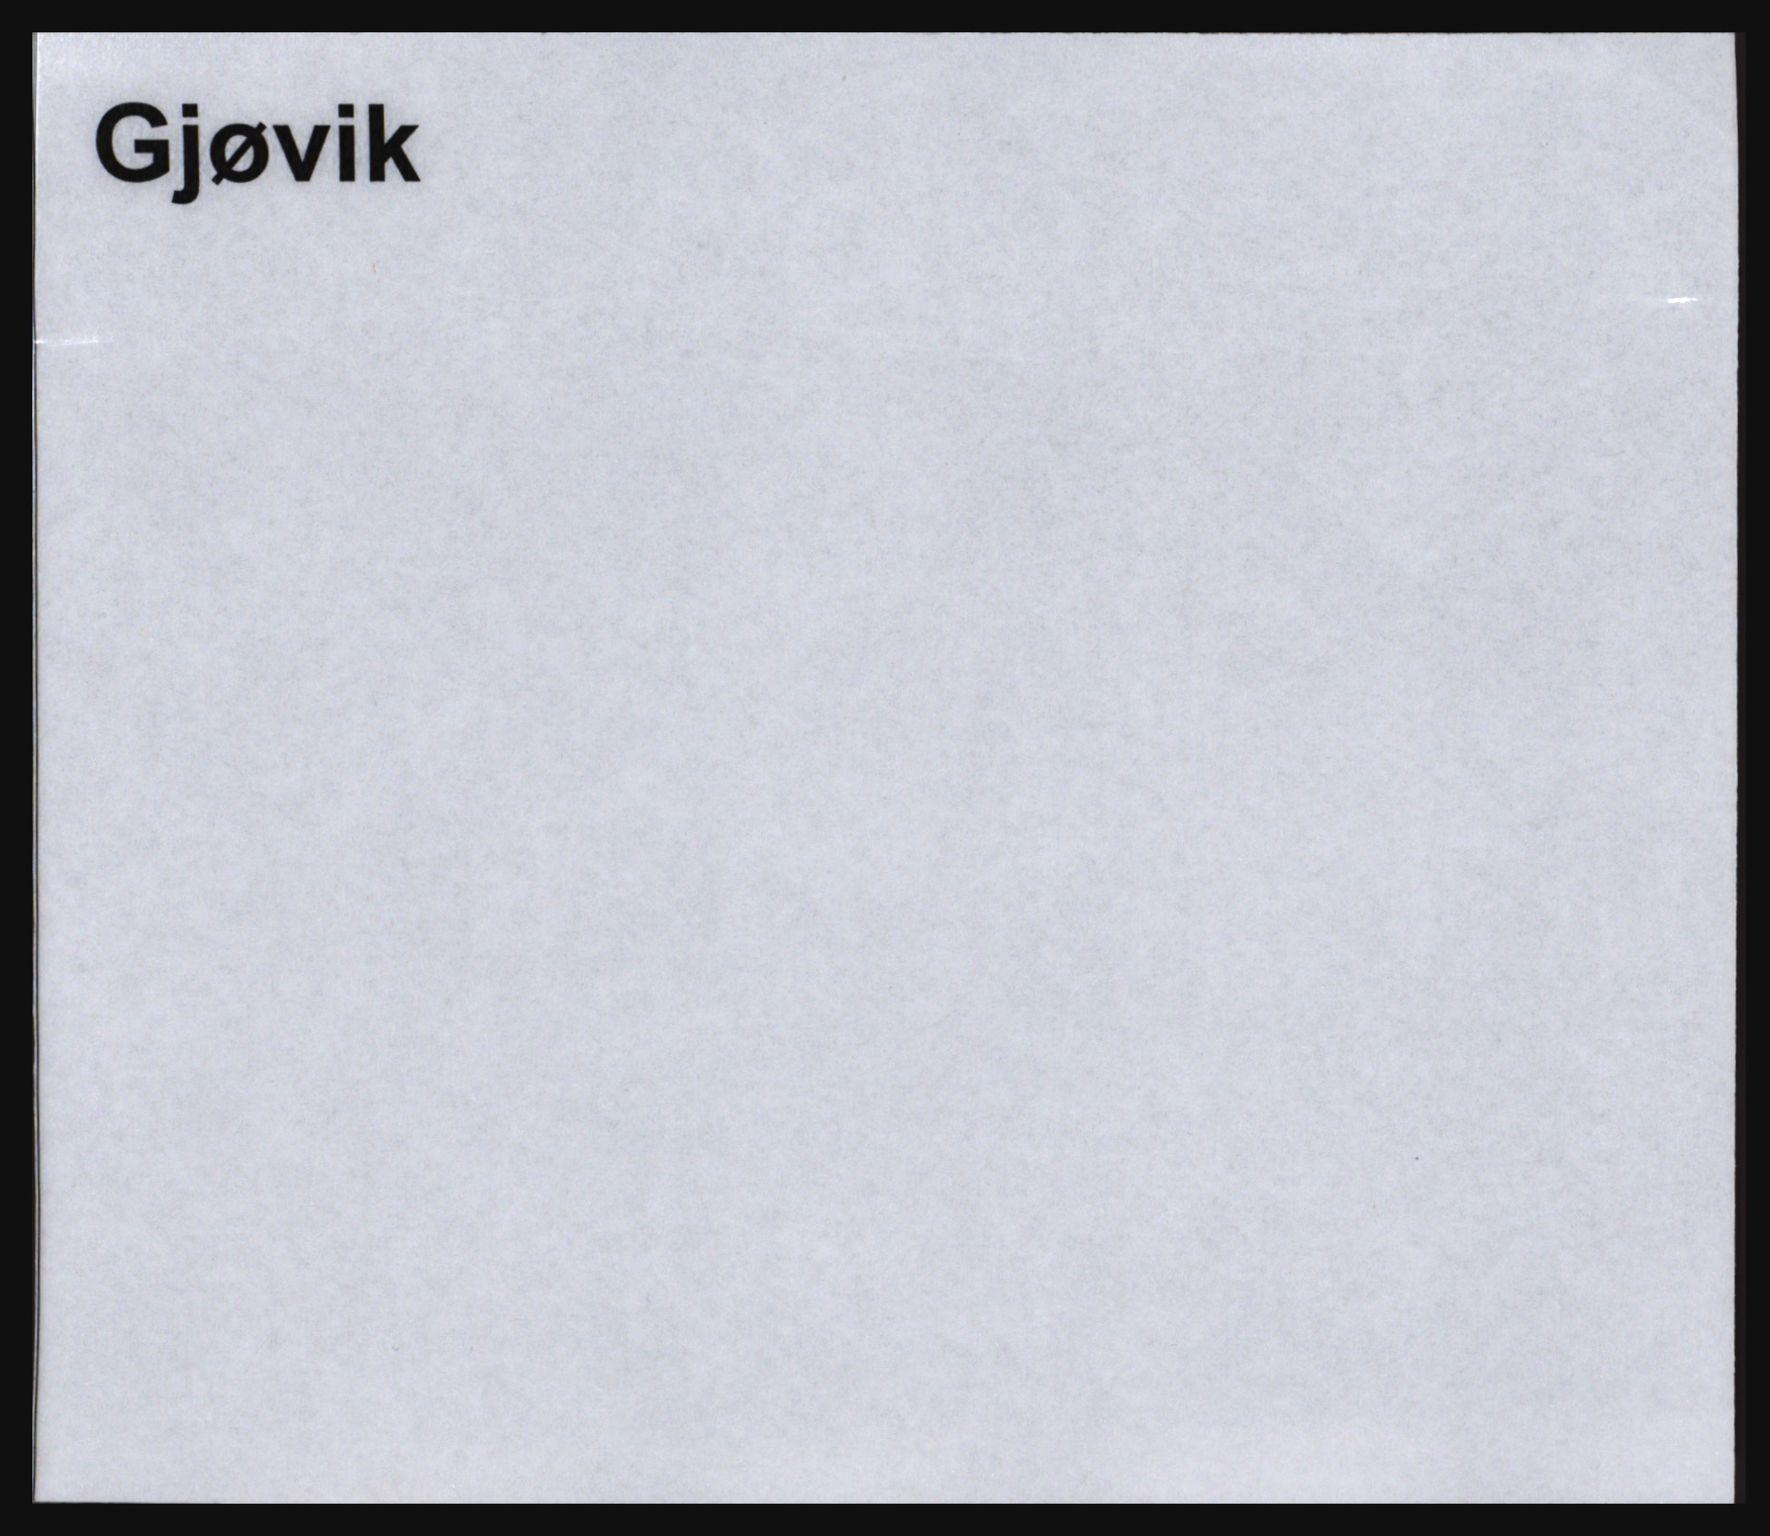 SAH, Norges Brannkasse, Gjøvik, s. 1